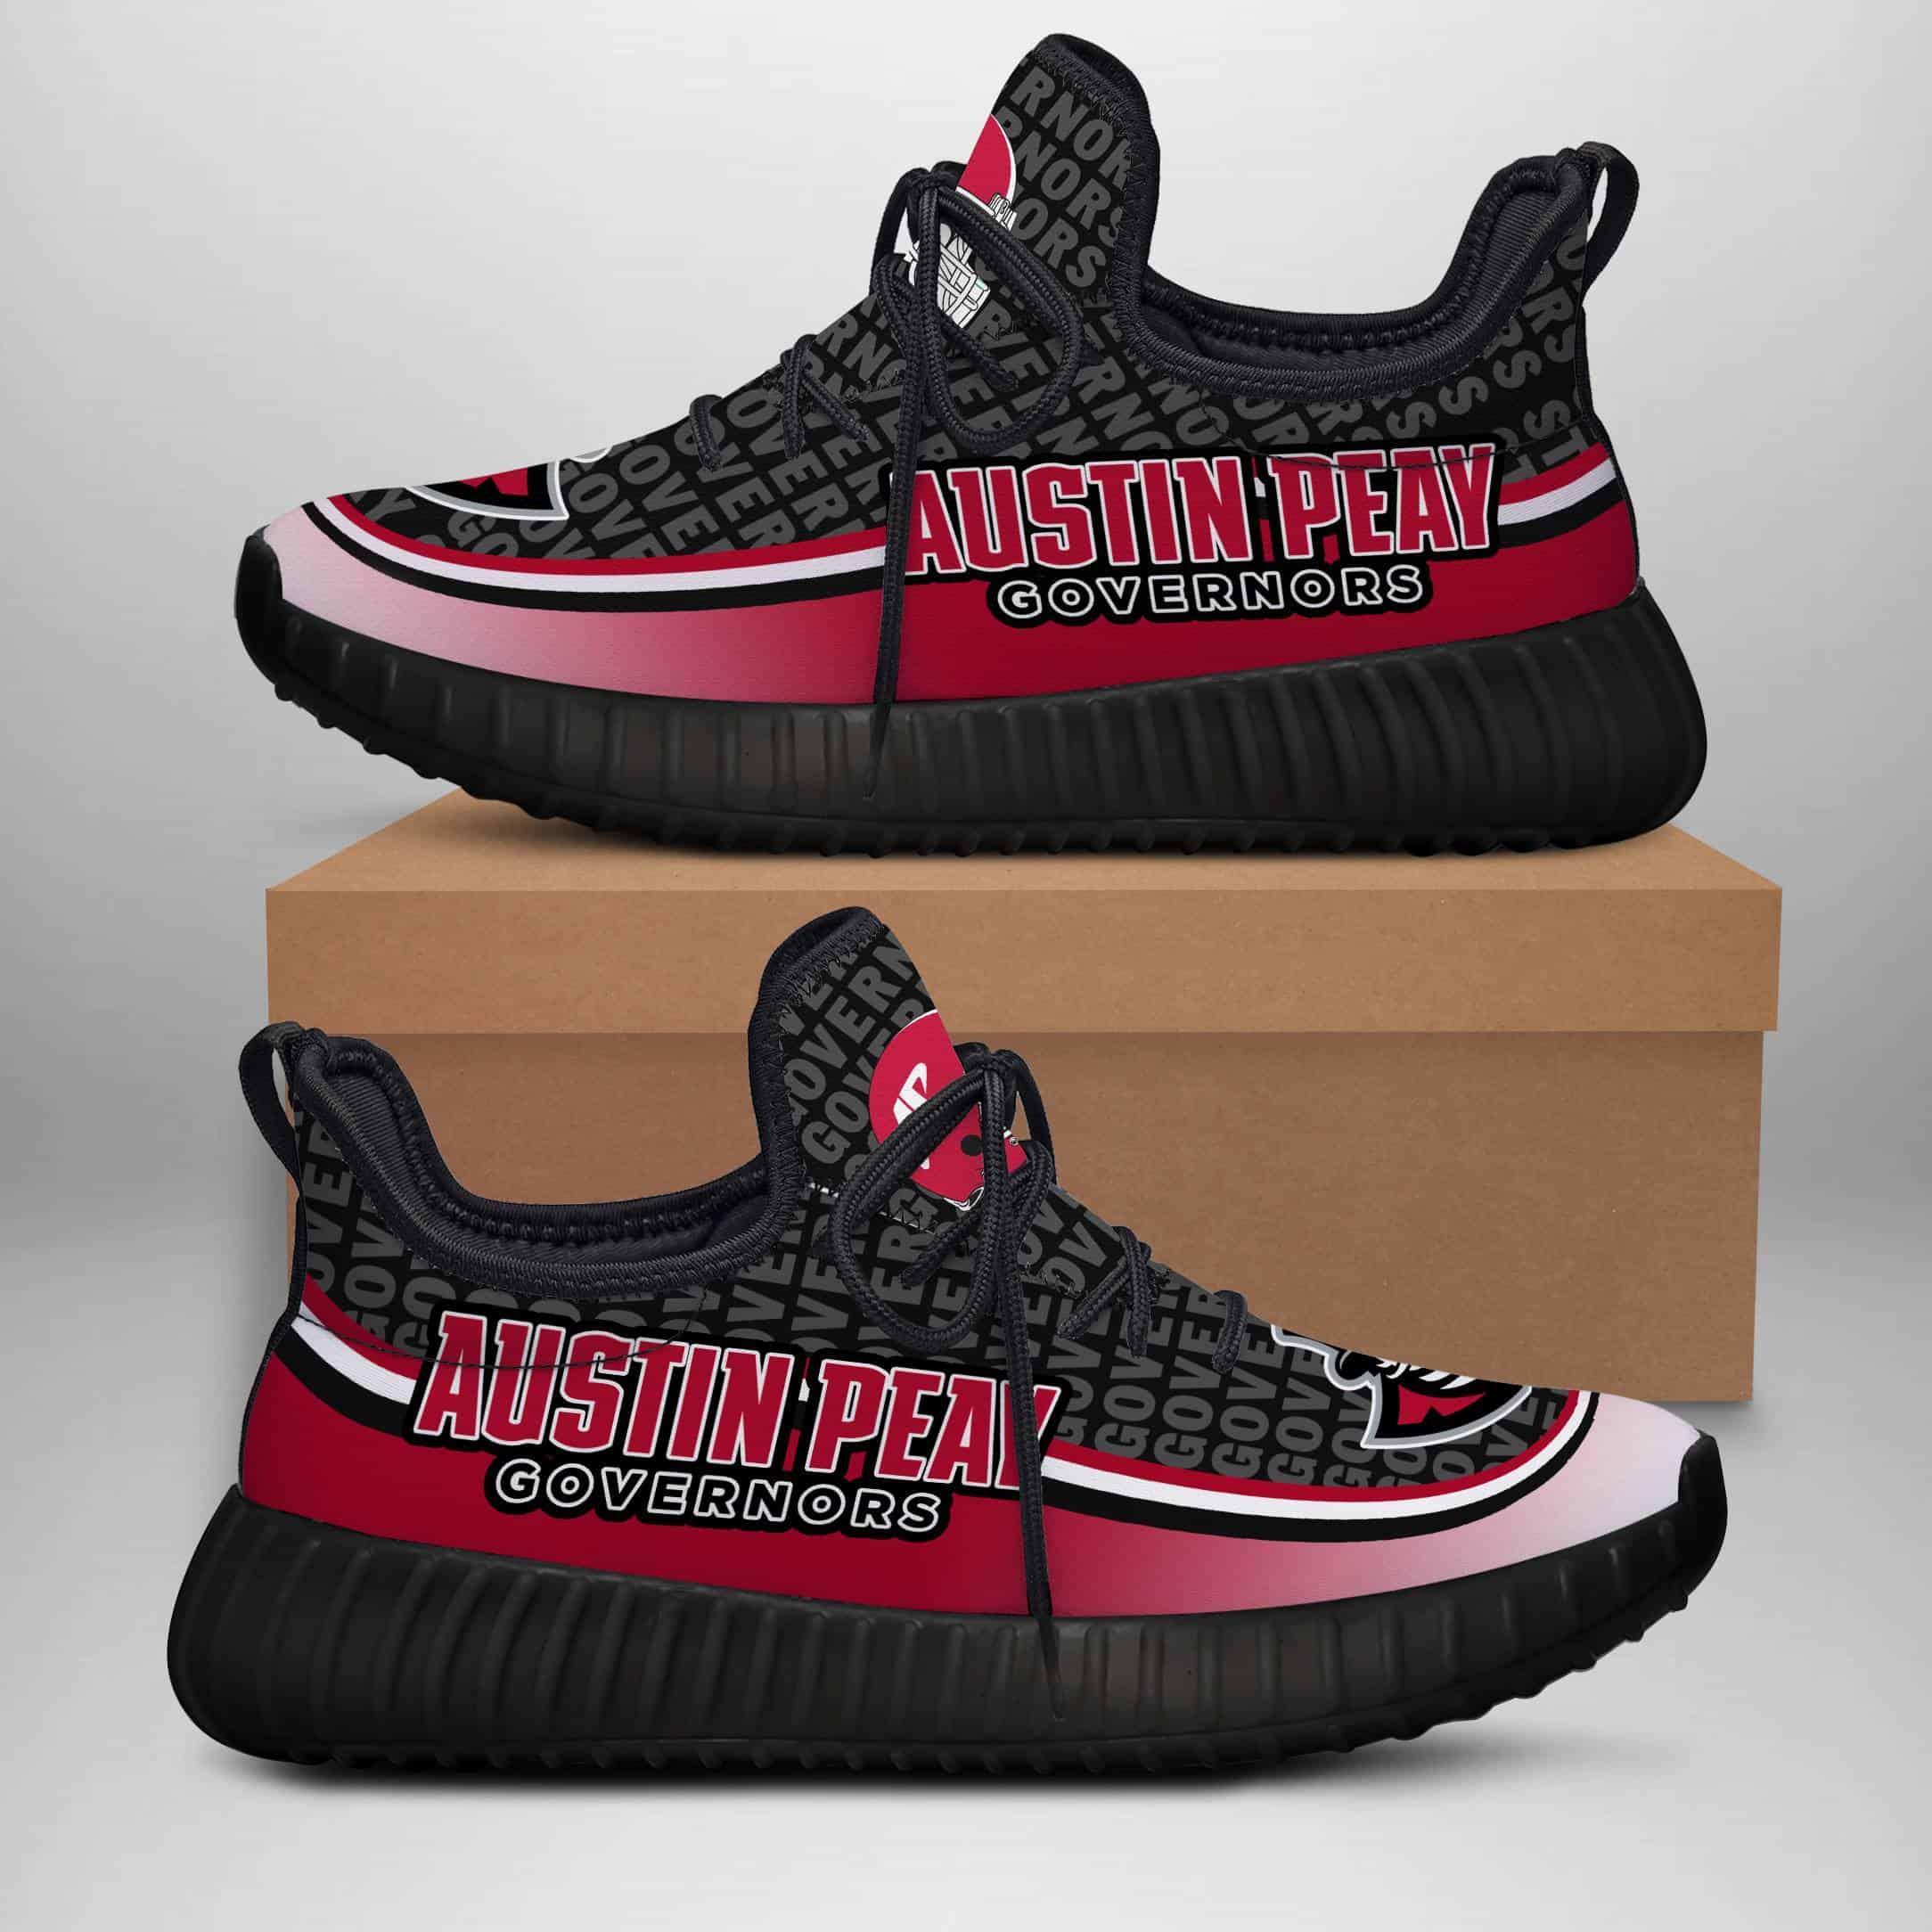 Austin Peay Governors Custom New Yeezy Sneaker